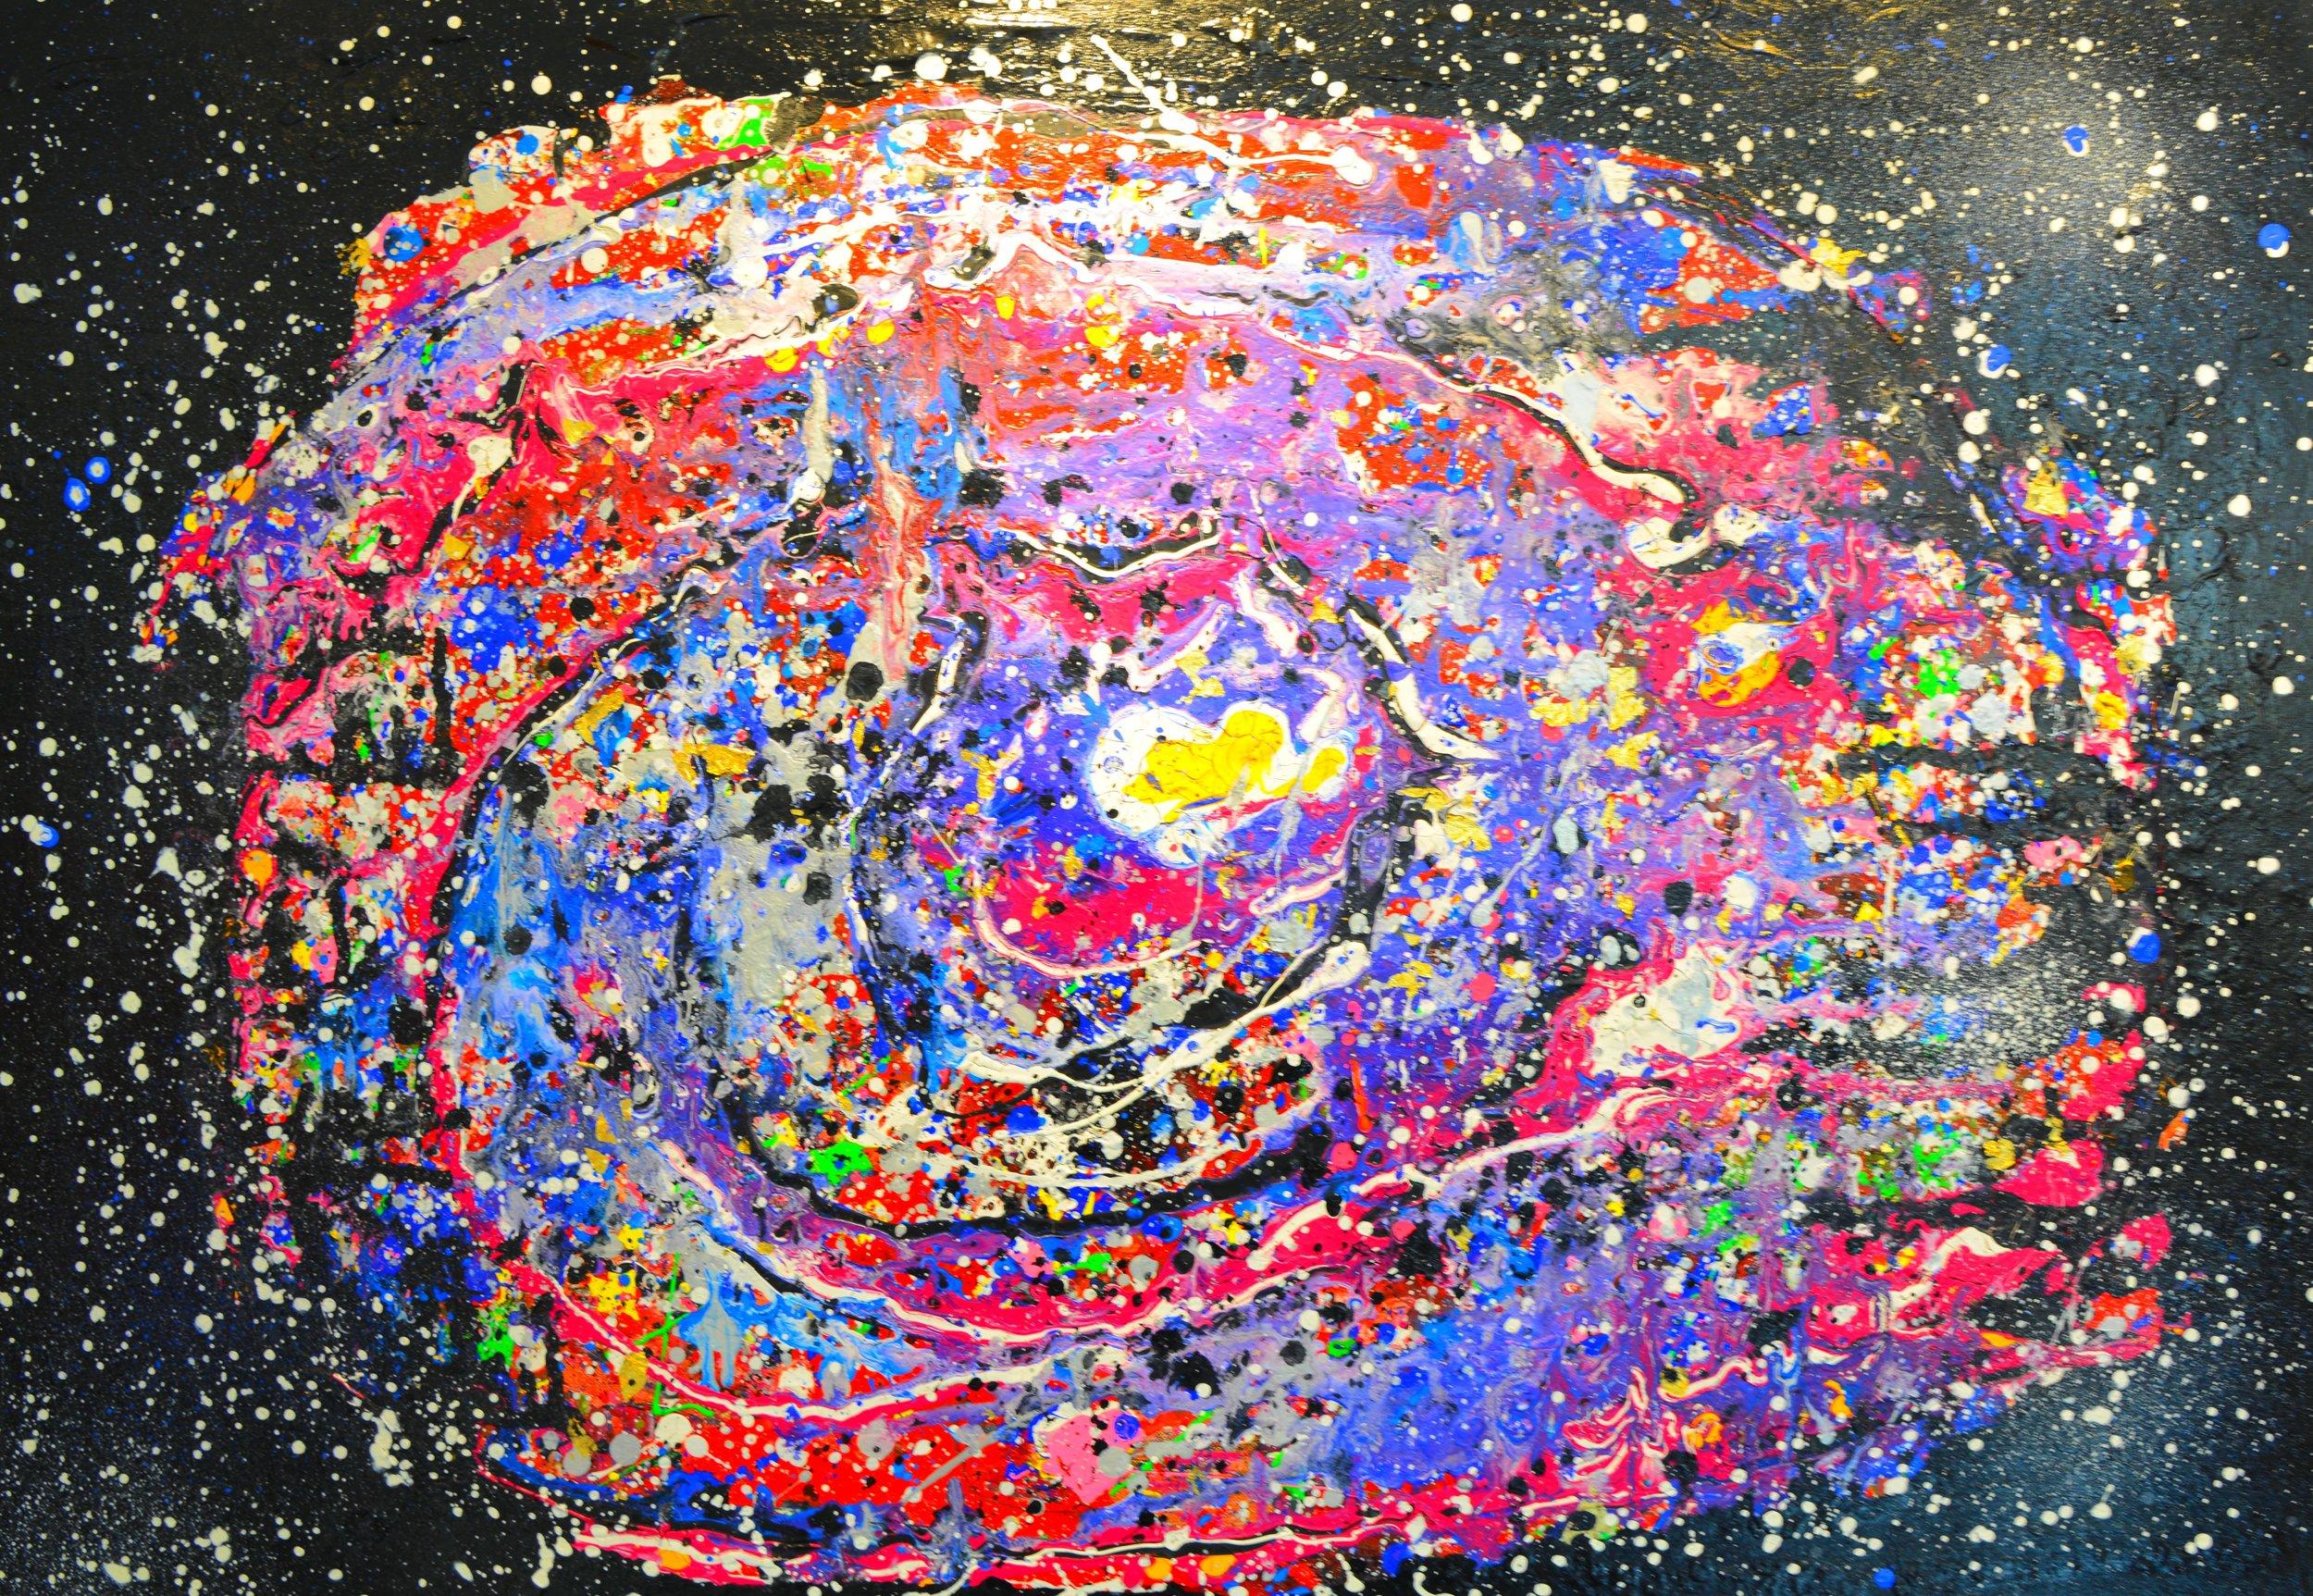 Spiegelei-Galaxie Acryl auf Leinwand